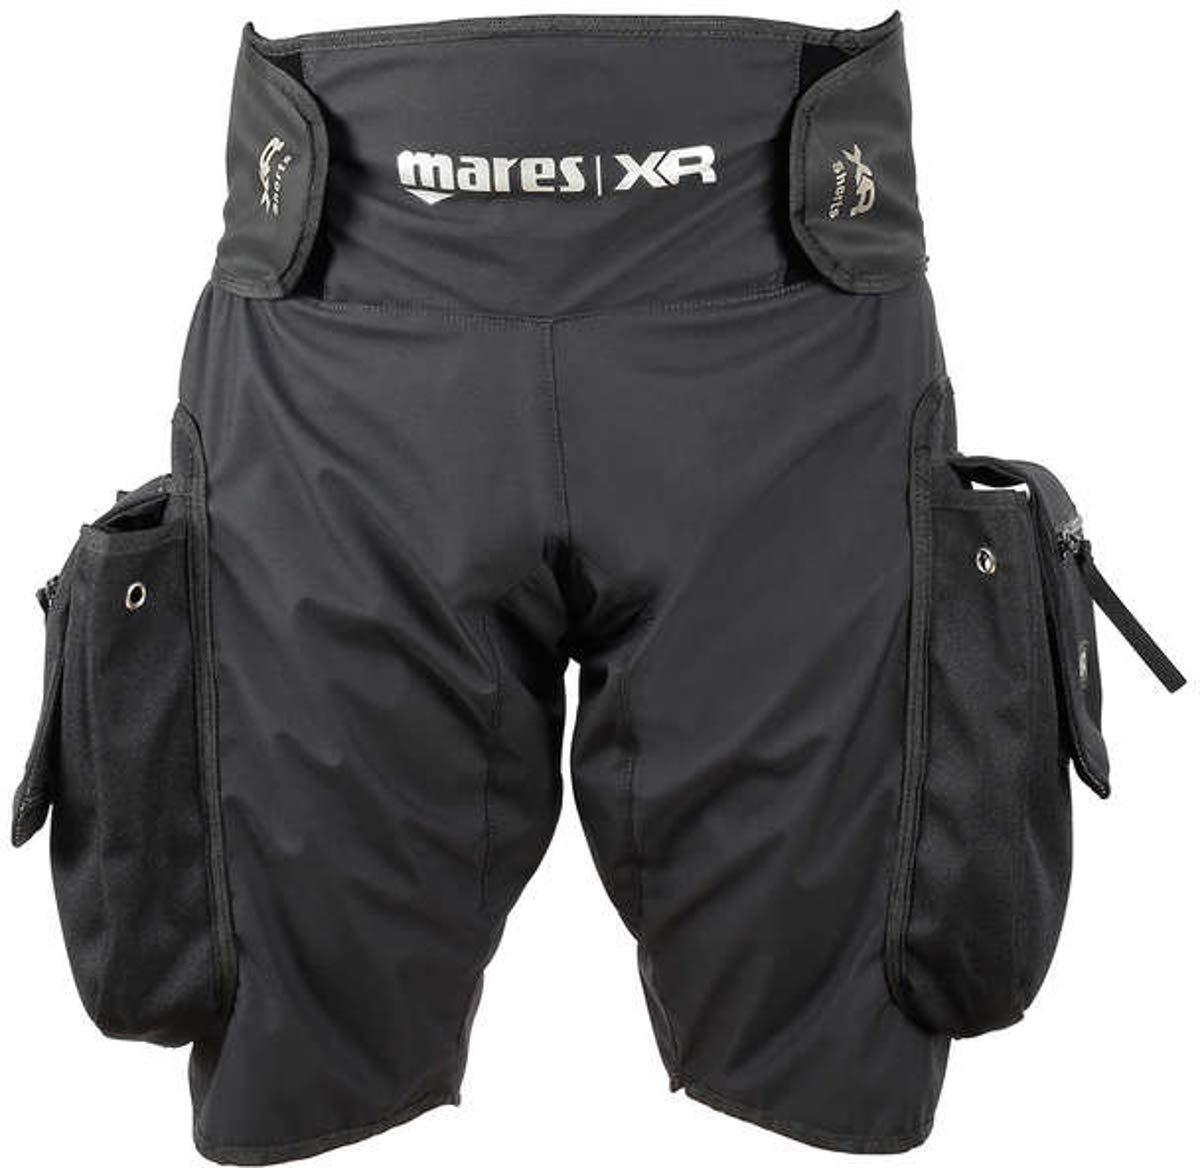 Mares XR TekポケットUntra Light Shorts Scuba DivingウェットスーツTech Gear 412032 B077BQXF9Y   Triple Extra Large (3X)